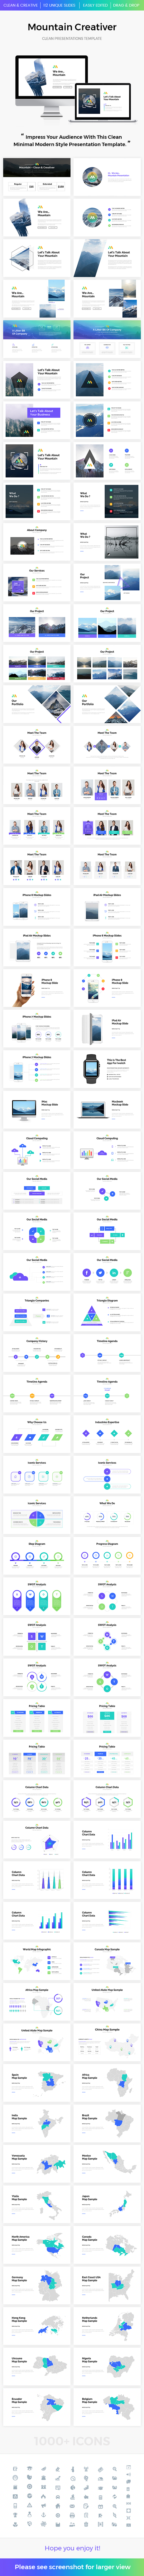 Mountain – Creativer Powerpoint Template - Creative PowerPoint Templates